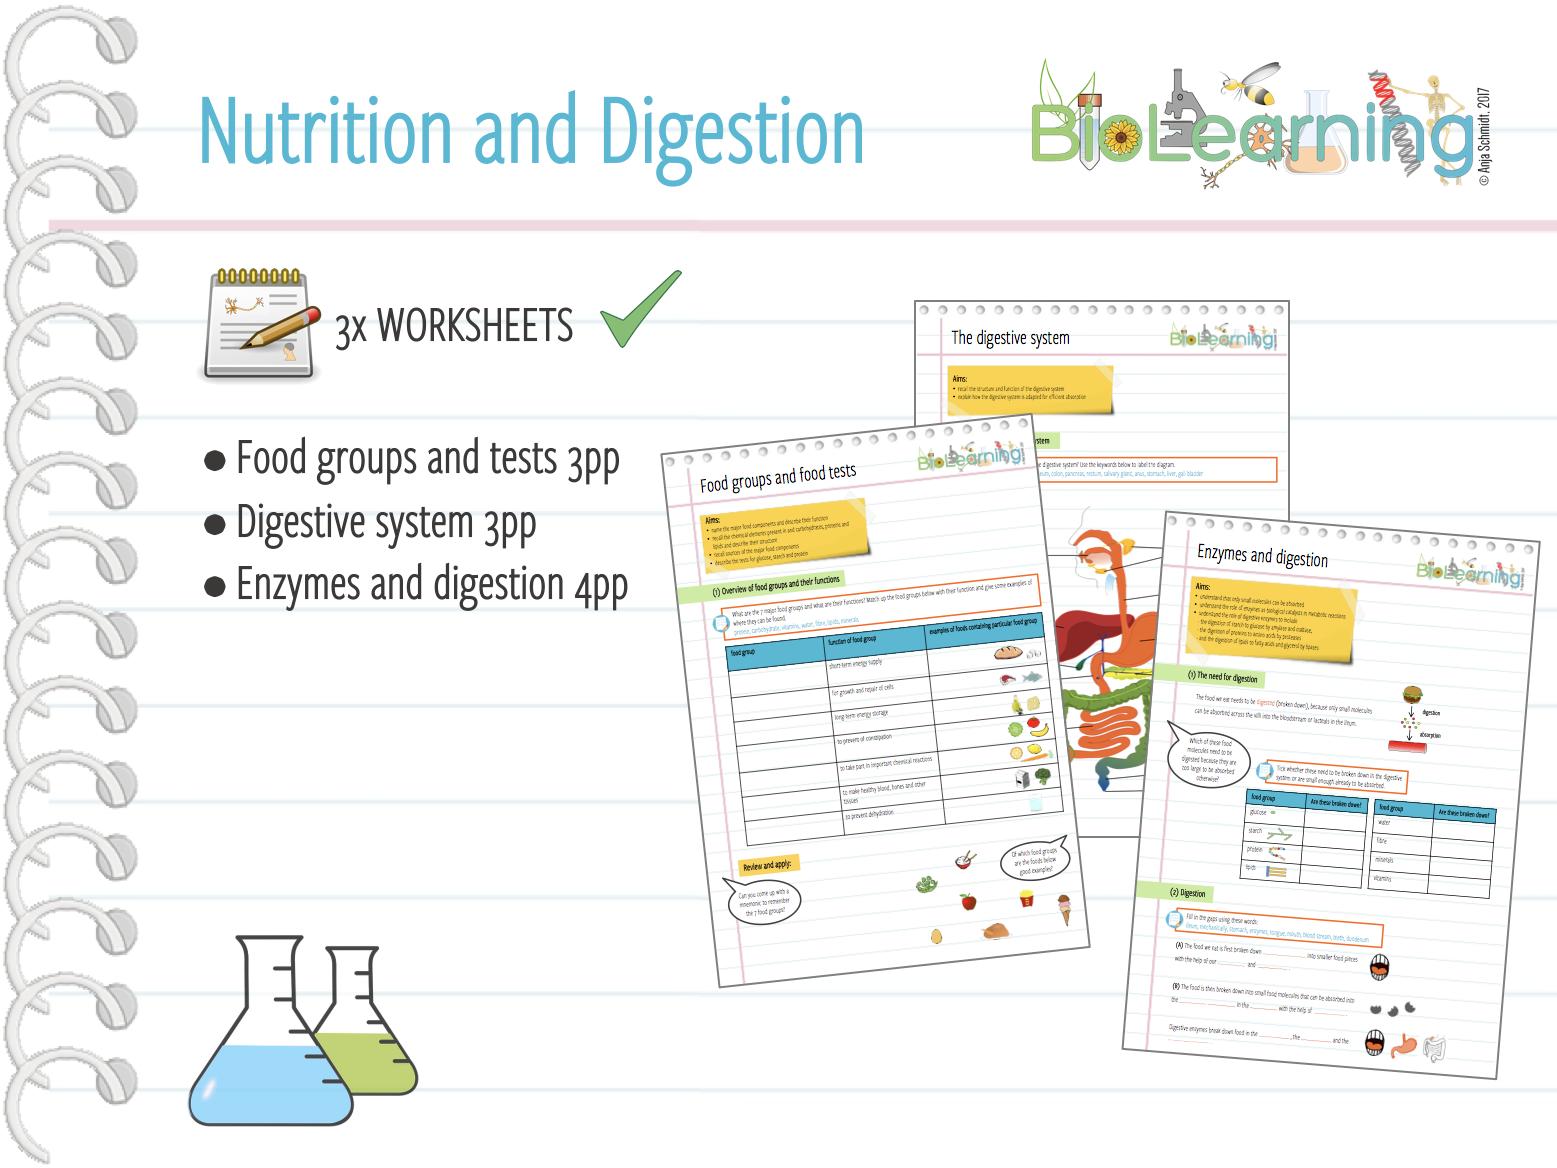 worksheet Nutrition Worksheets nutrition and digestion 3 worksheets ks3ks4 by anjacschmidt teaching resources tes